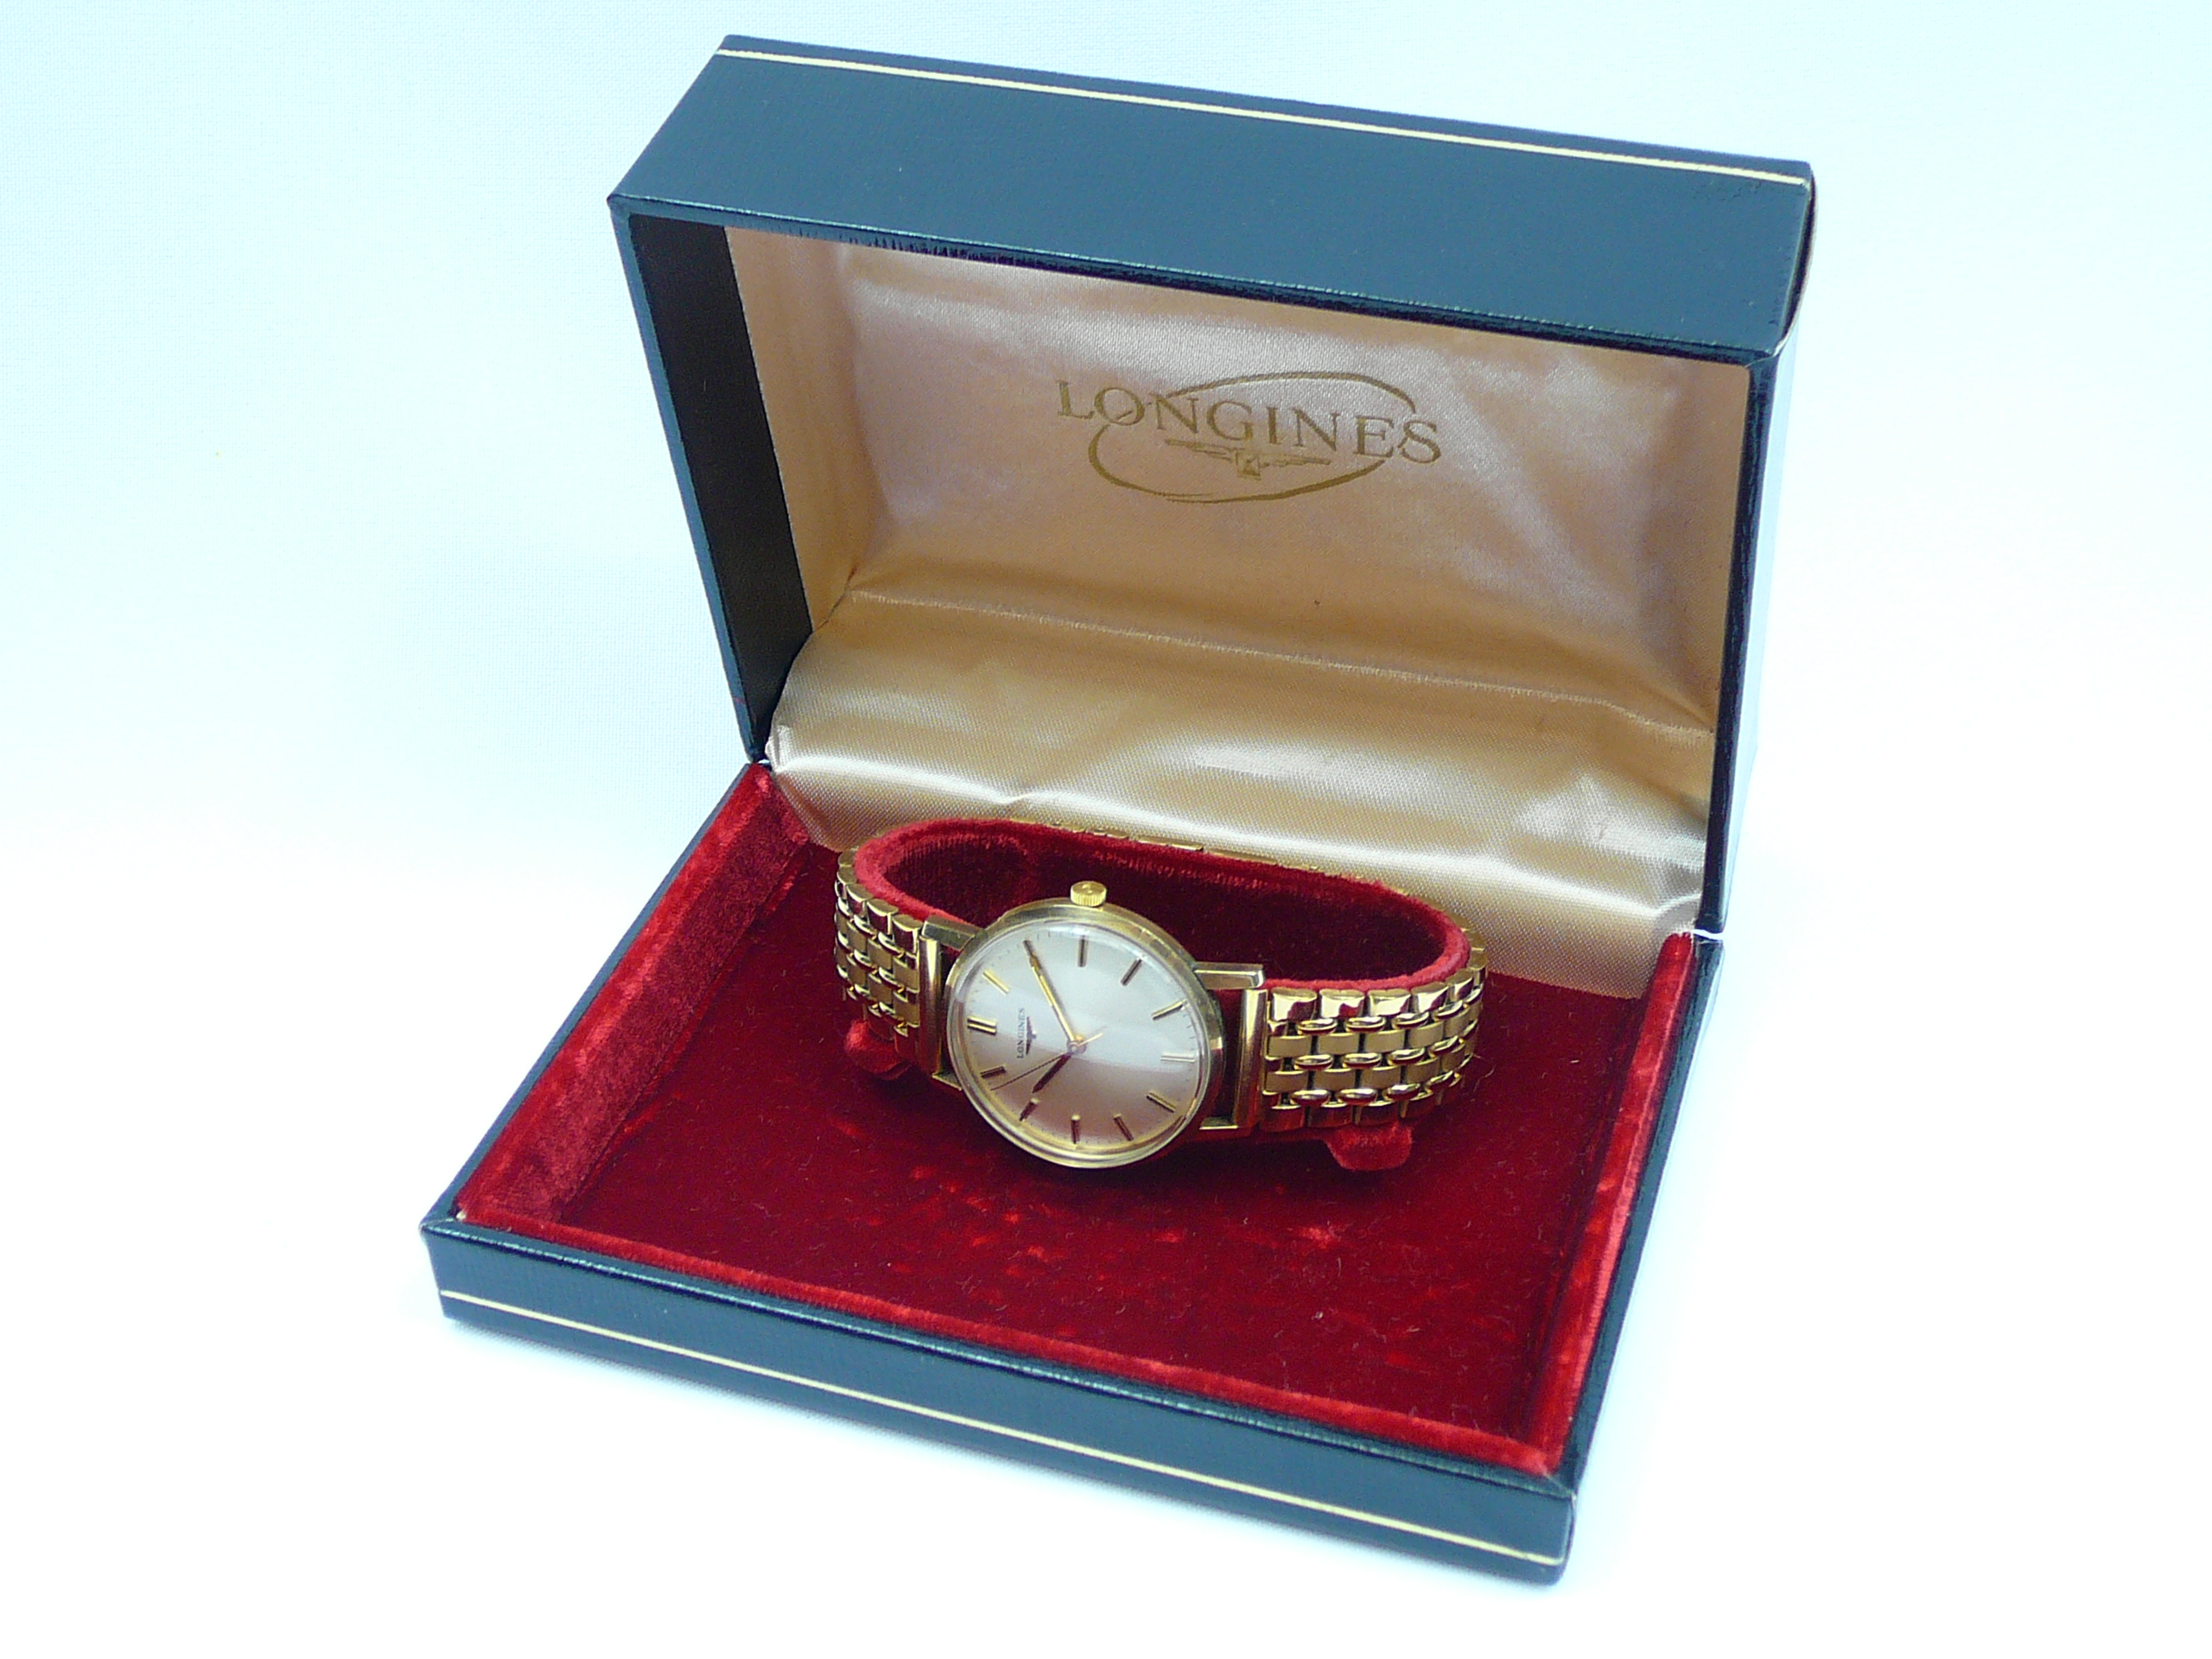 Gents Vintage Gold Longines Wrist Watch - Image 5 of 5